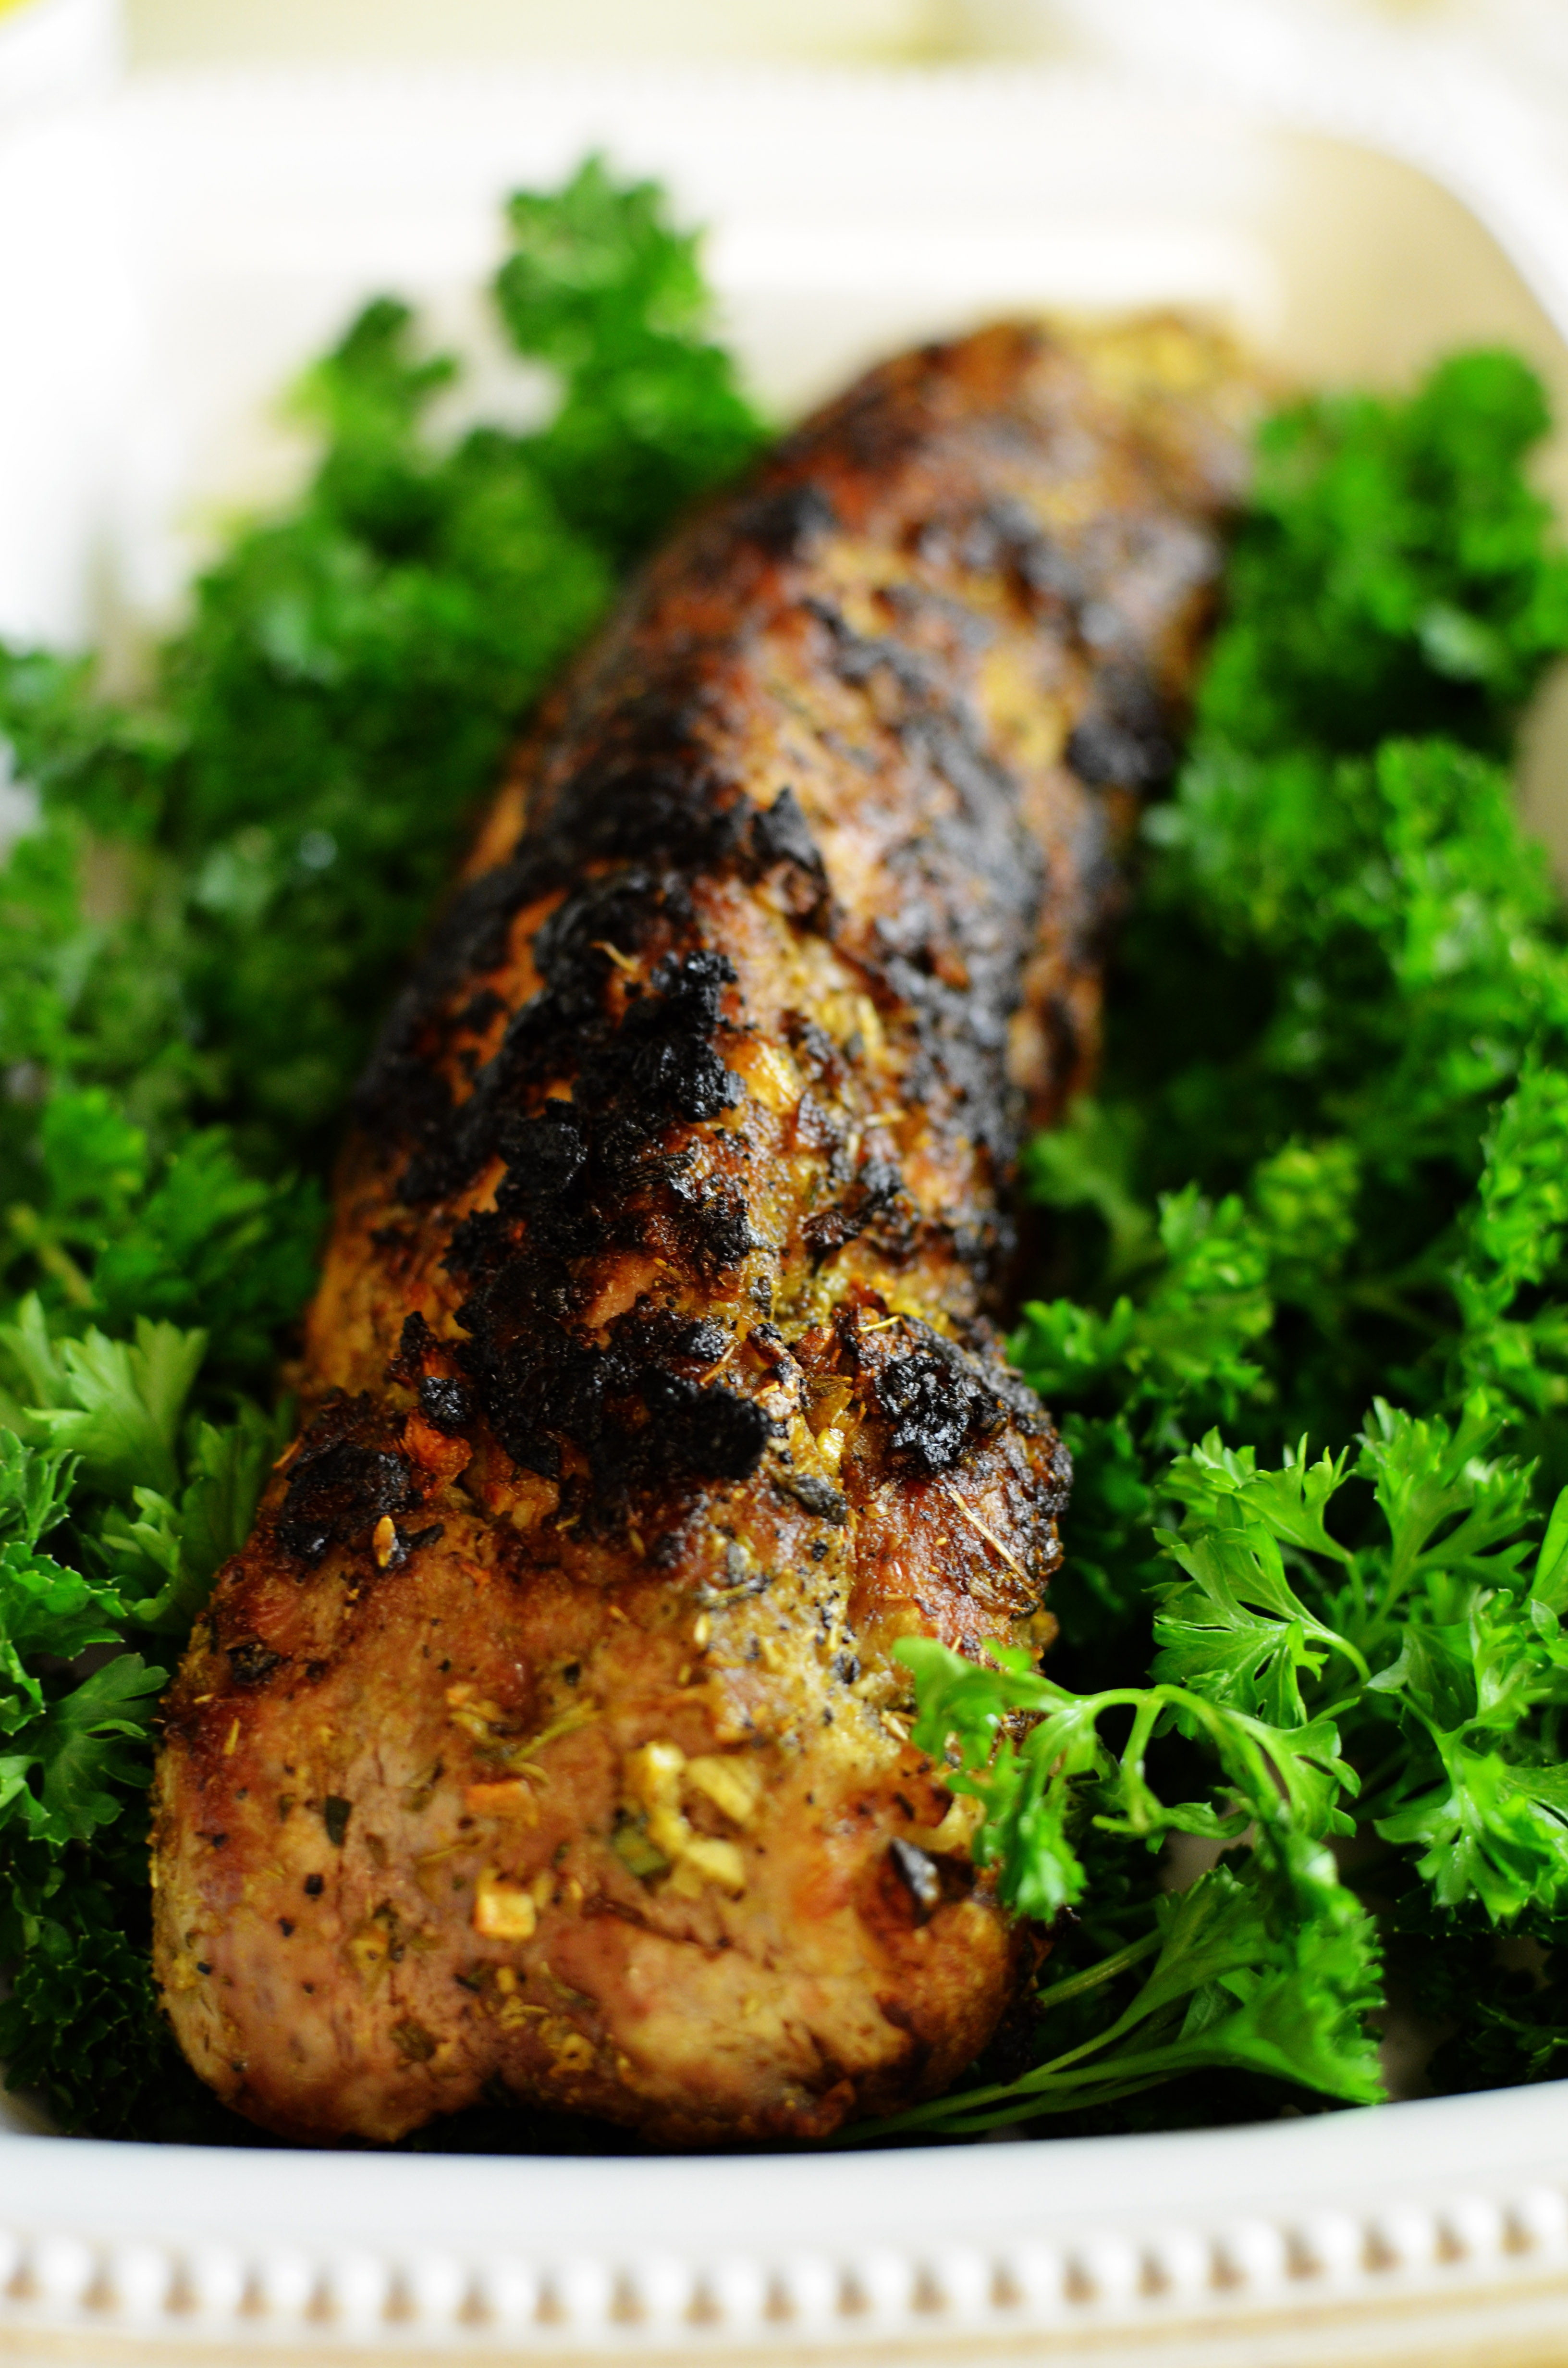 Pork Loin Dry Rub  Roasted Pork Tenderloin with a Dry Rub